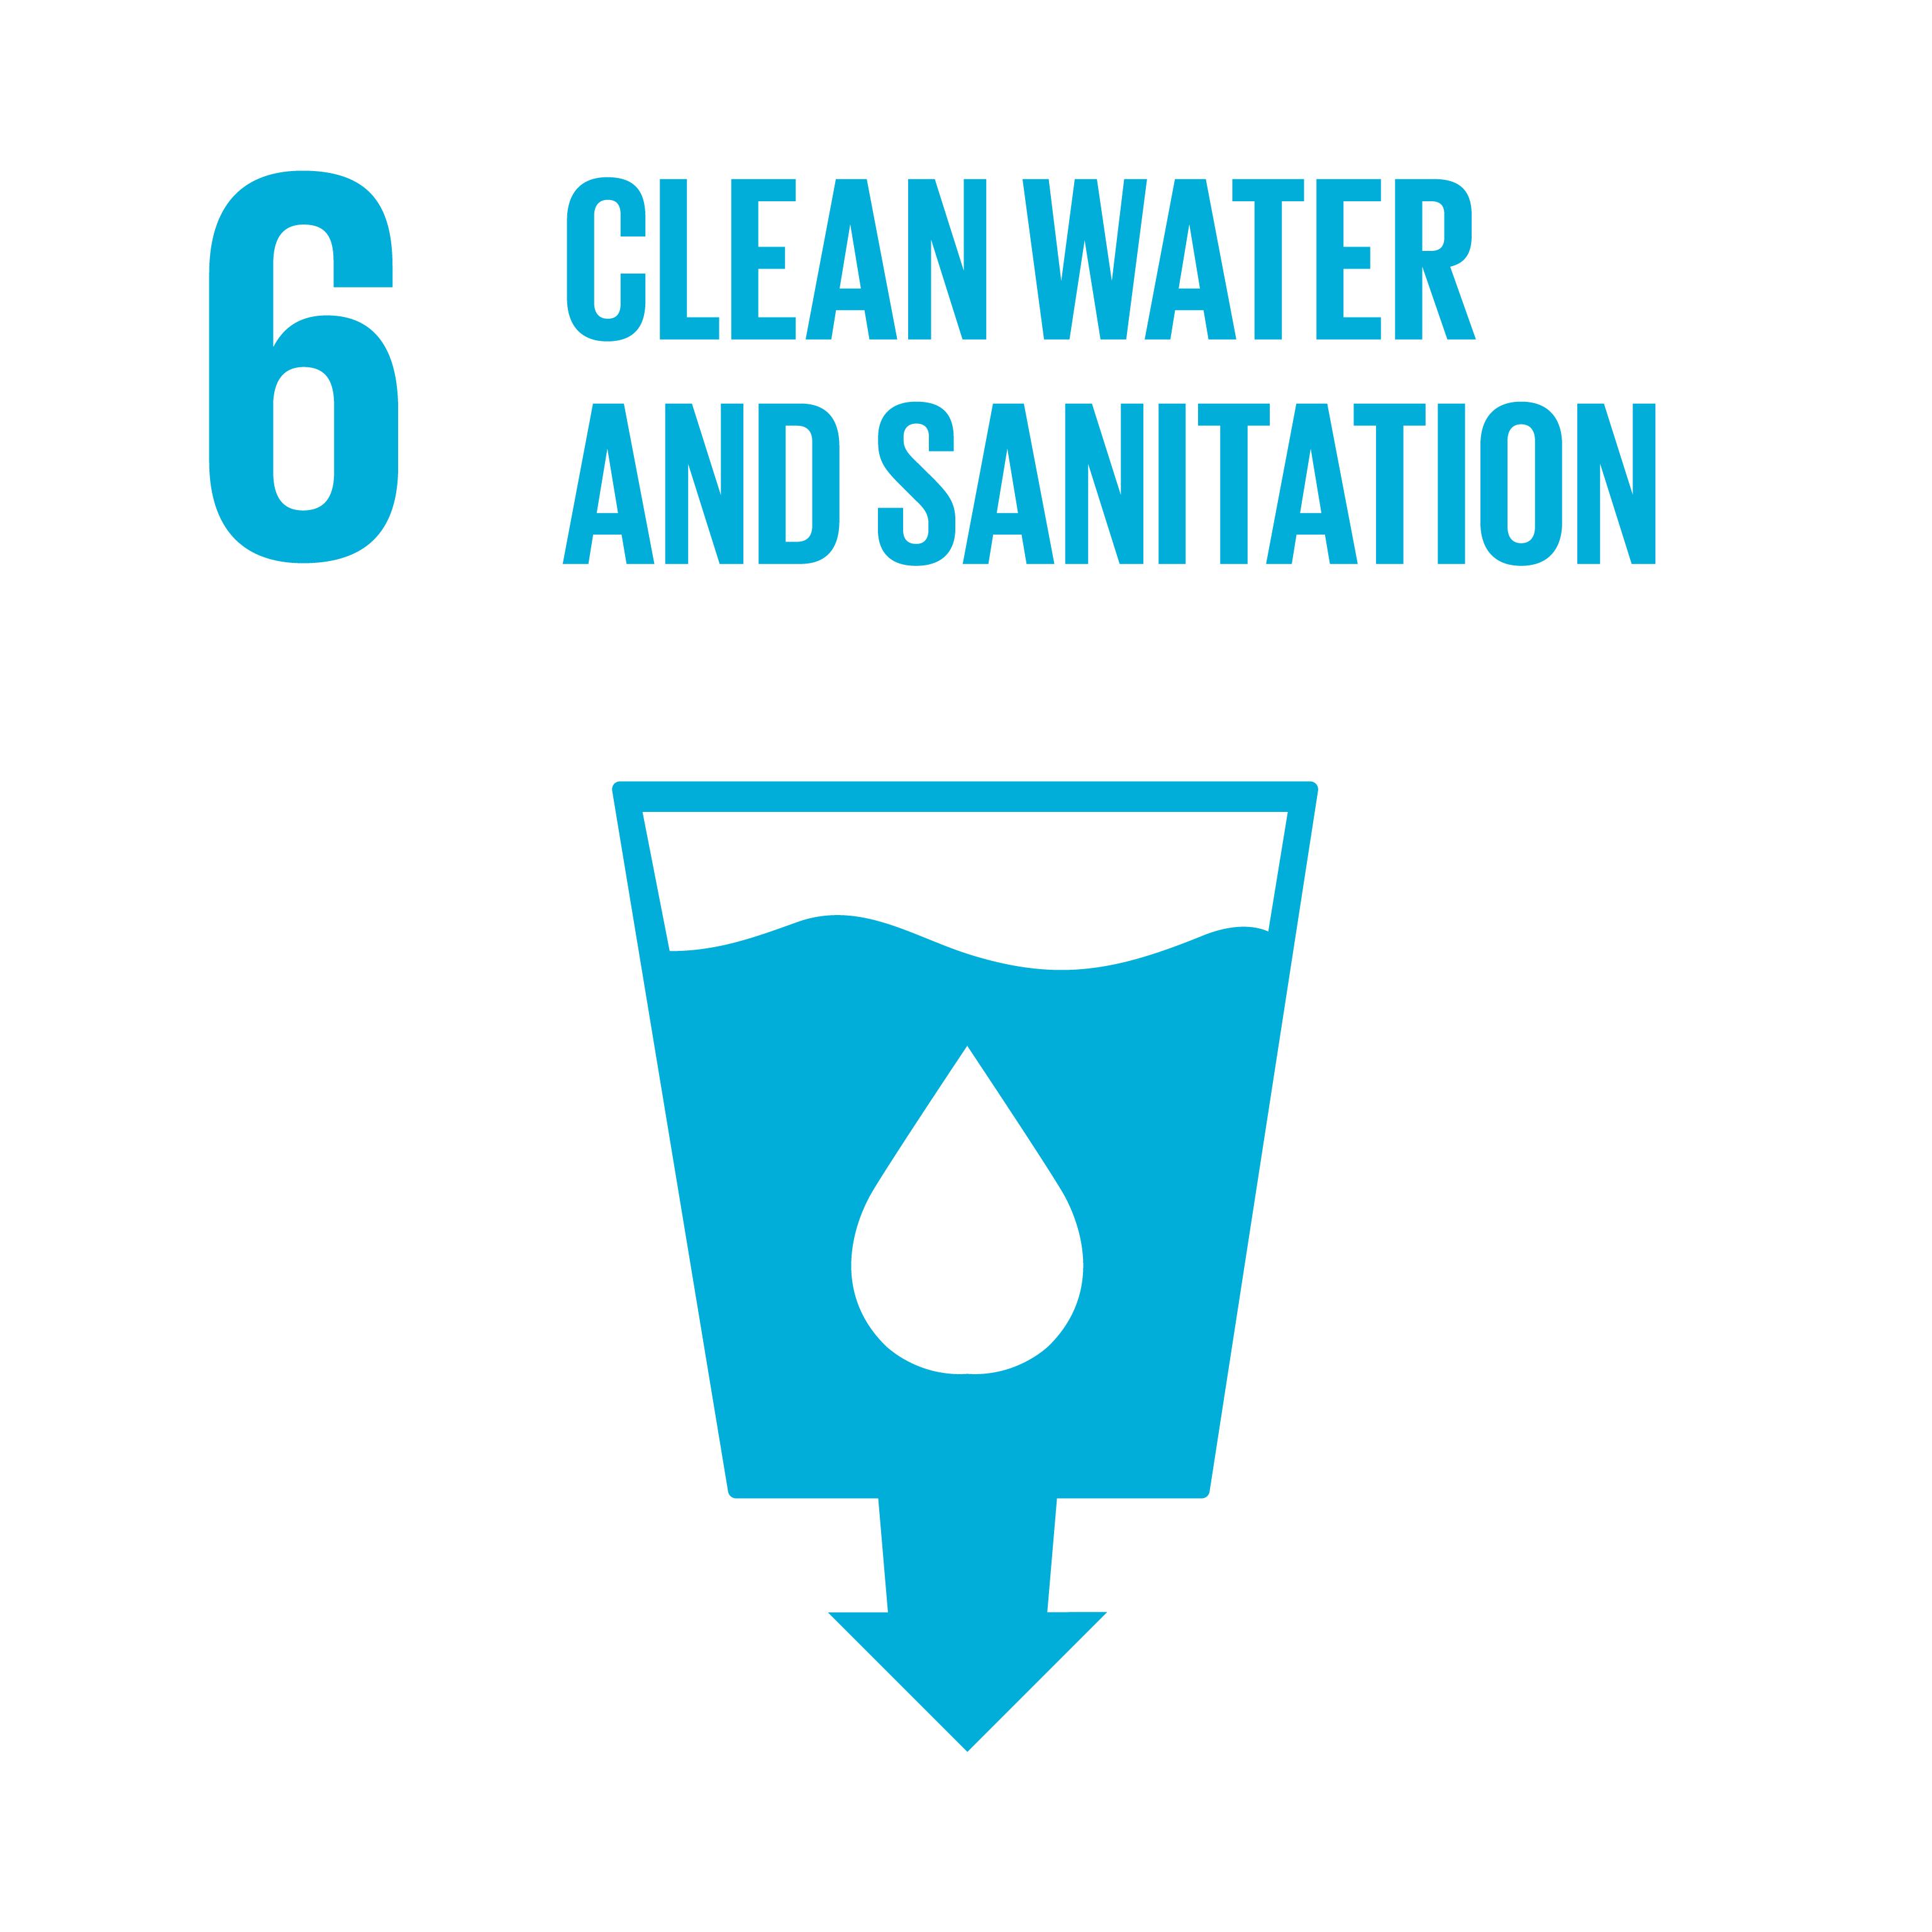 Sustainable Development Goals 06 clean water sanitation